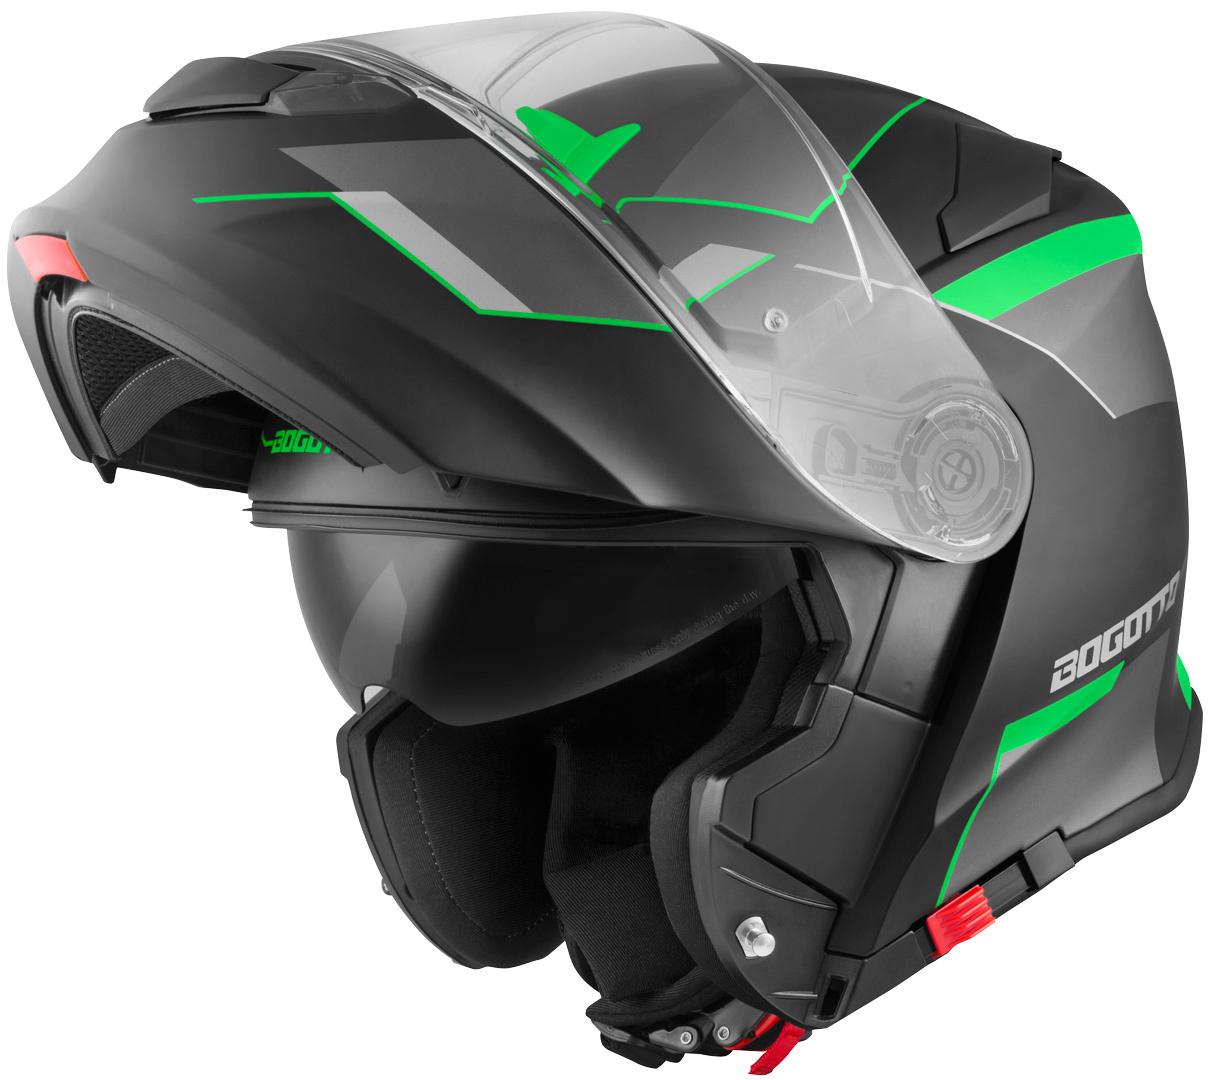 Bogotto V271 Delta Klapphelm, schwarz-grün, Größe XL, schwarz-grün, Größe XL